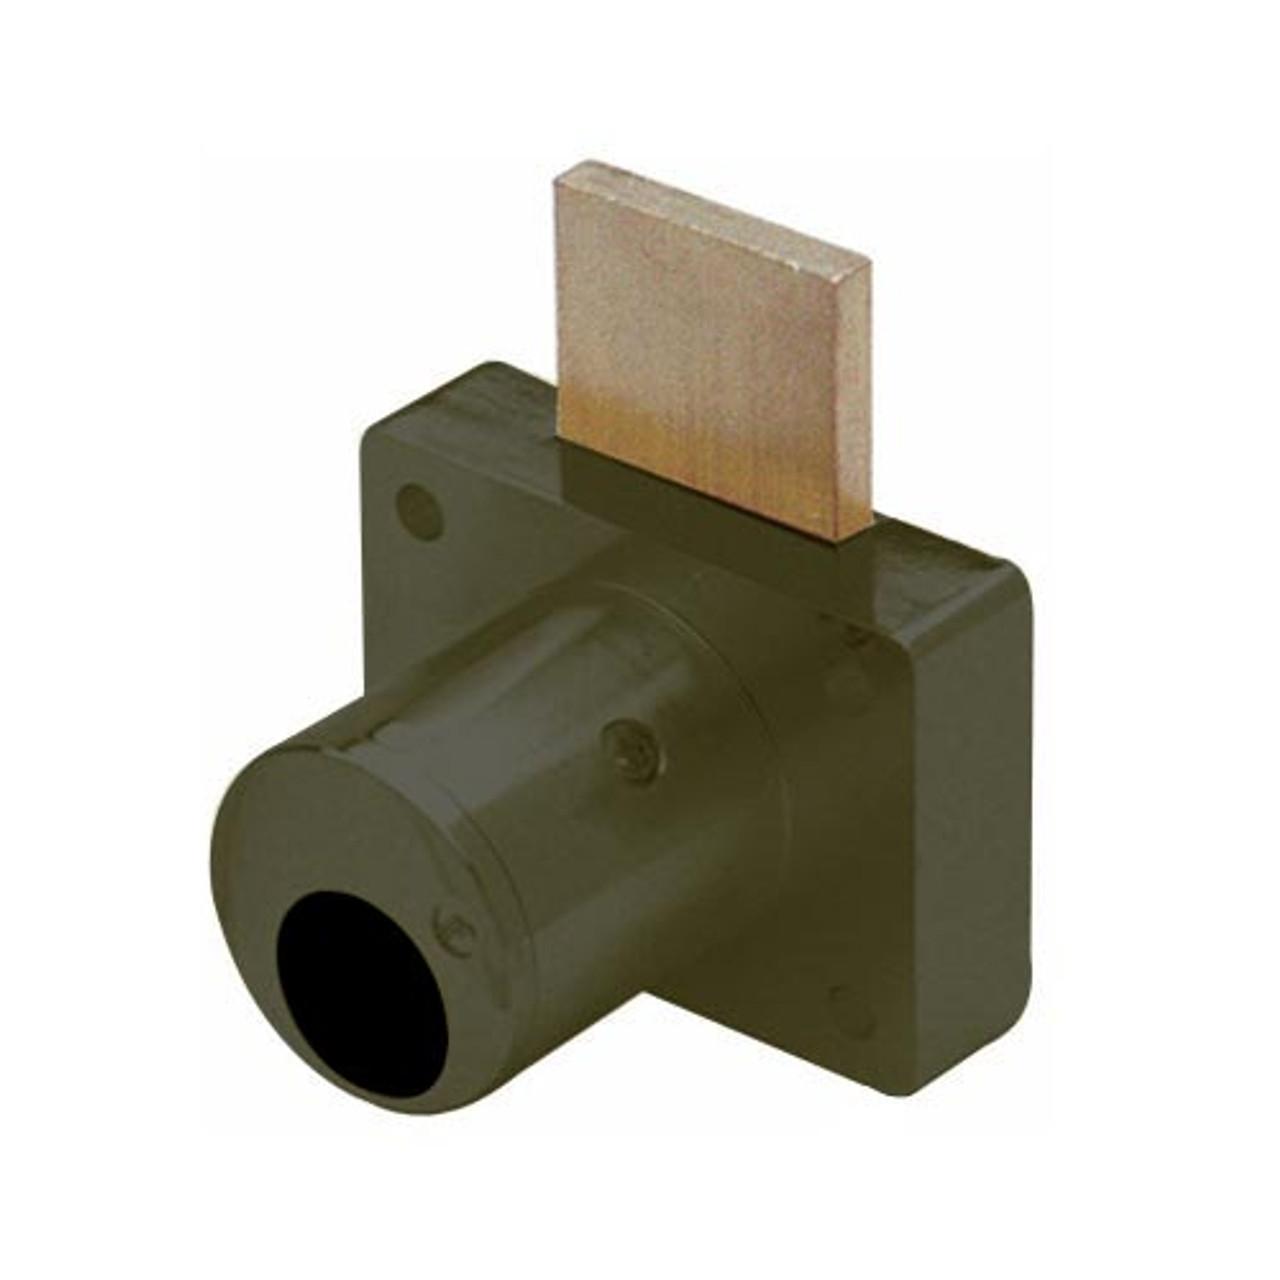 Olympus 800LCA-10B Cabinet Drawer Deadbolt Less Cylinder Assa Lock in Oil Rubbed Bronze